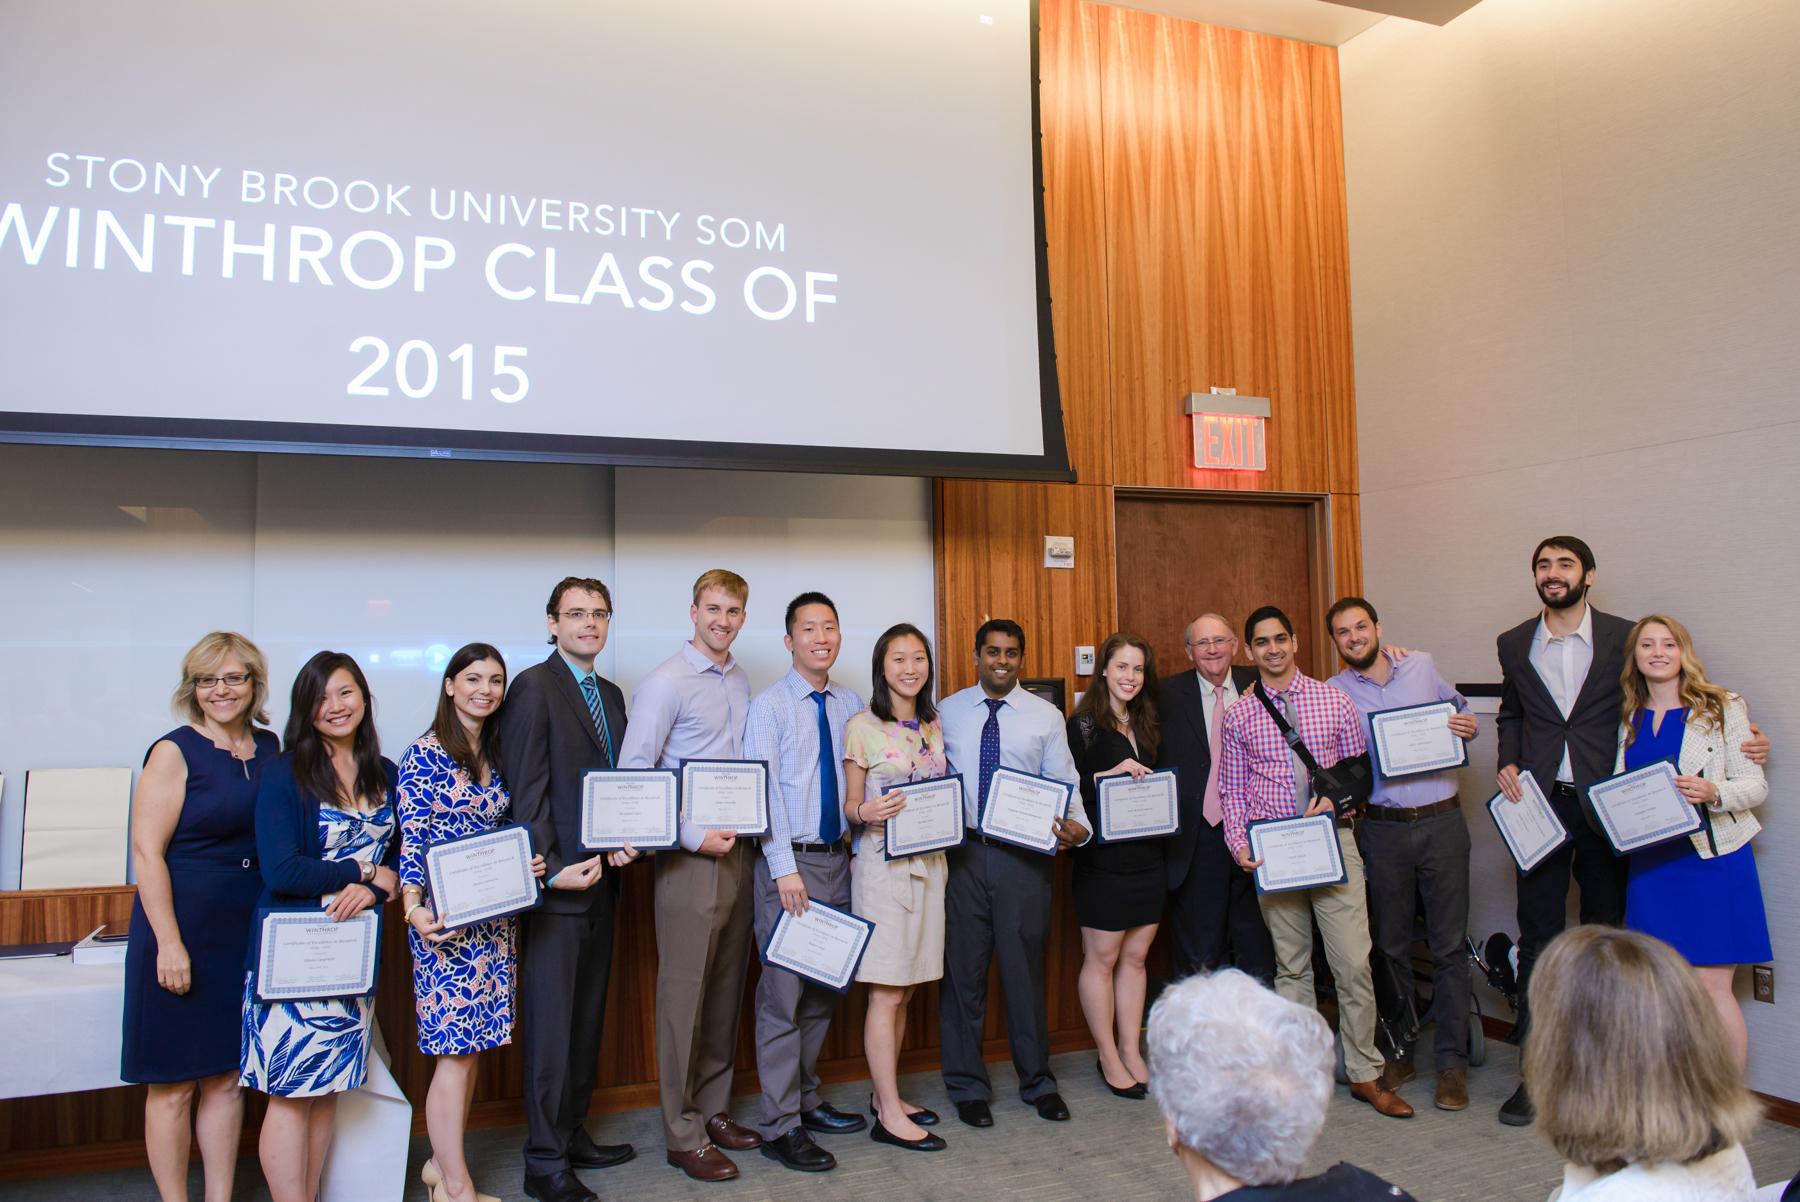 Winthrop_Graduation-57.jpg